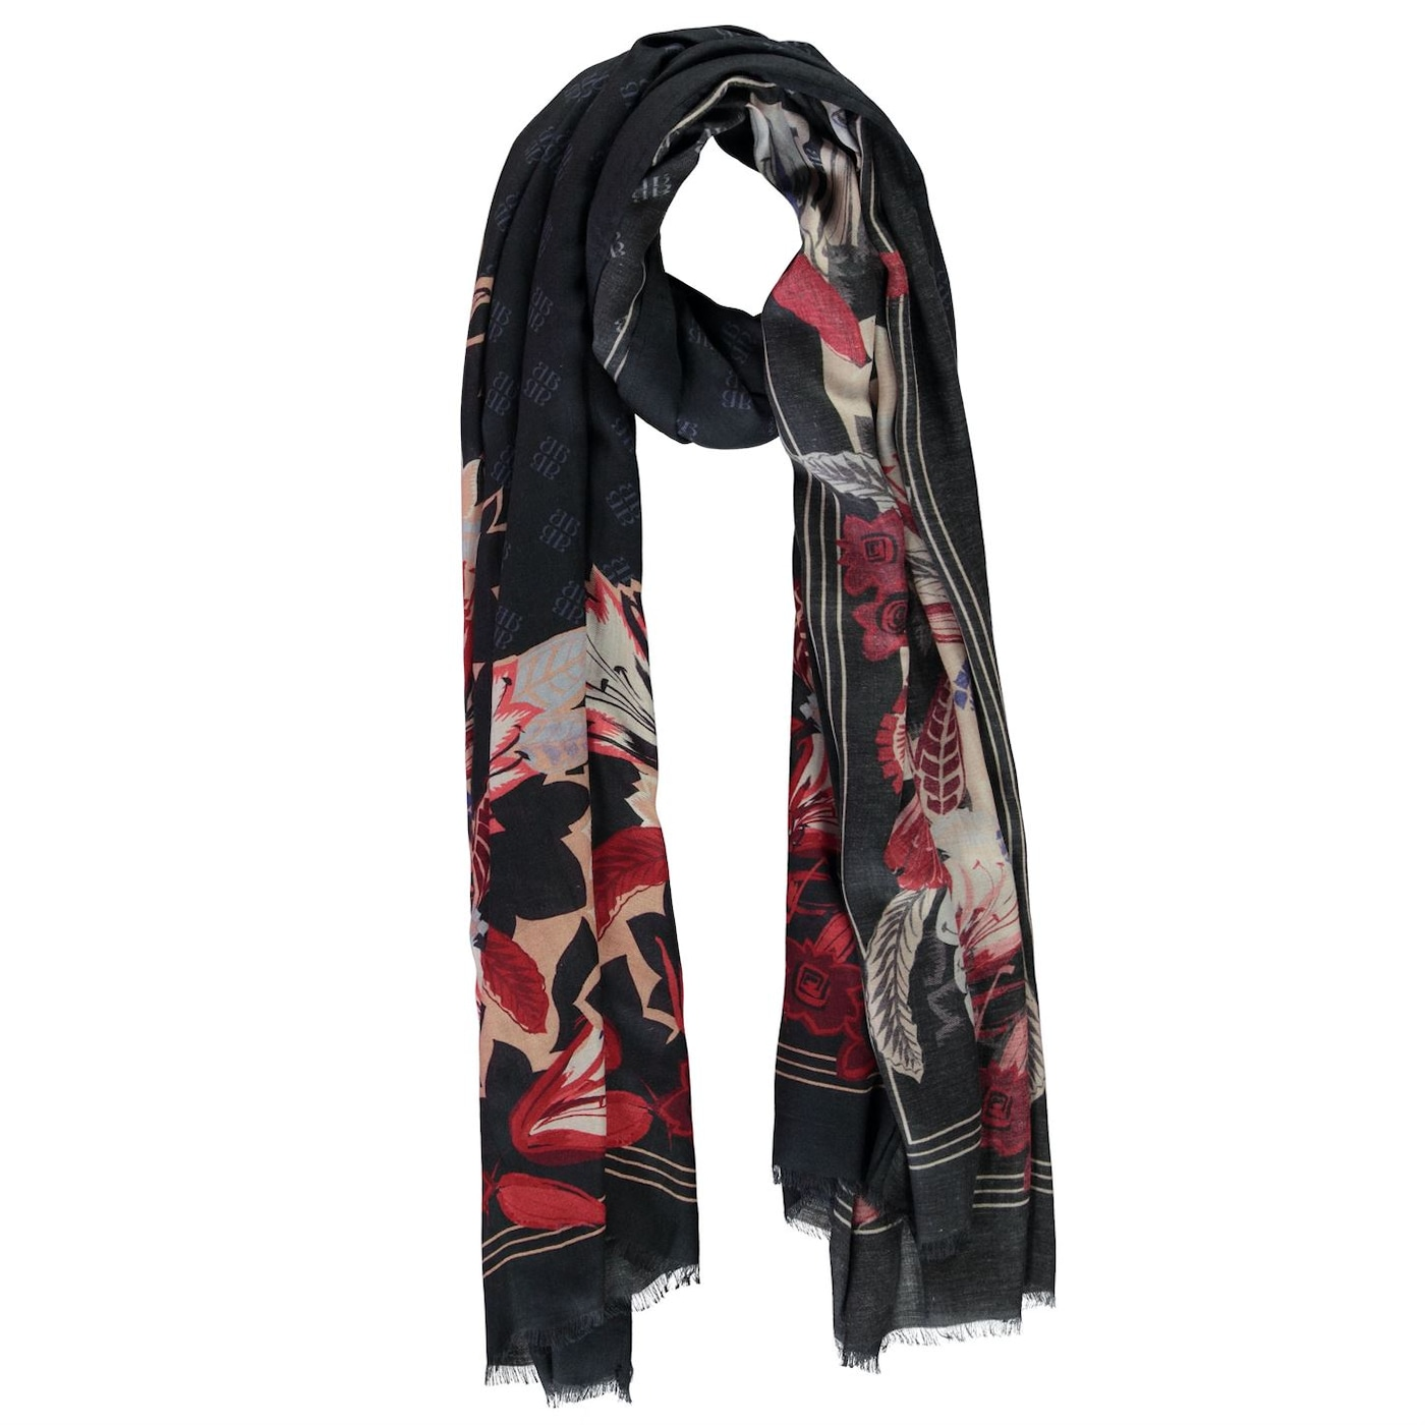 Biba Fan lily border scarf